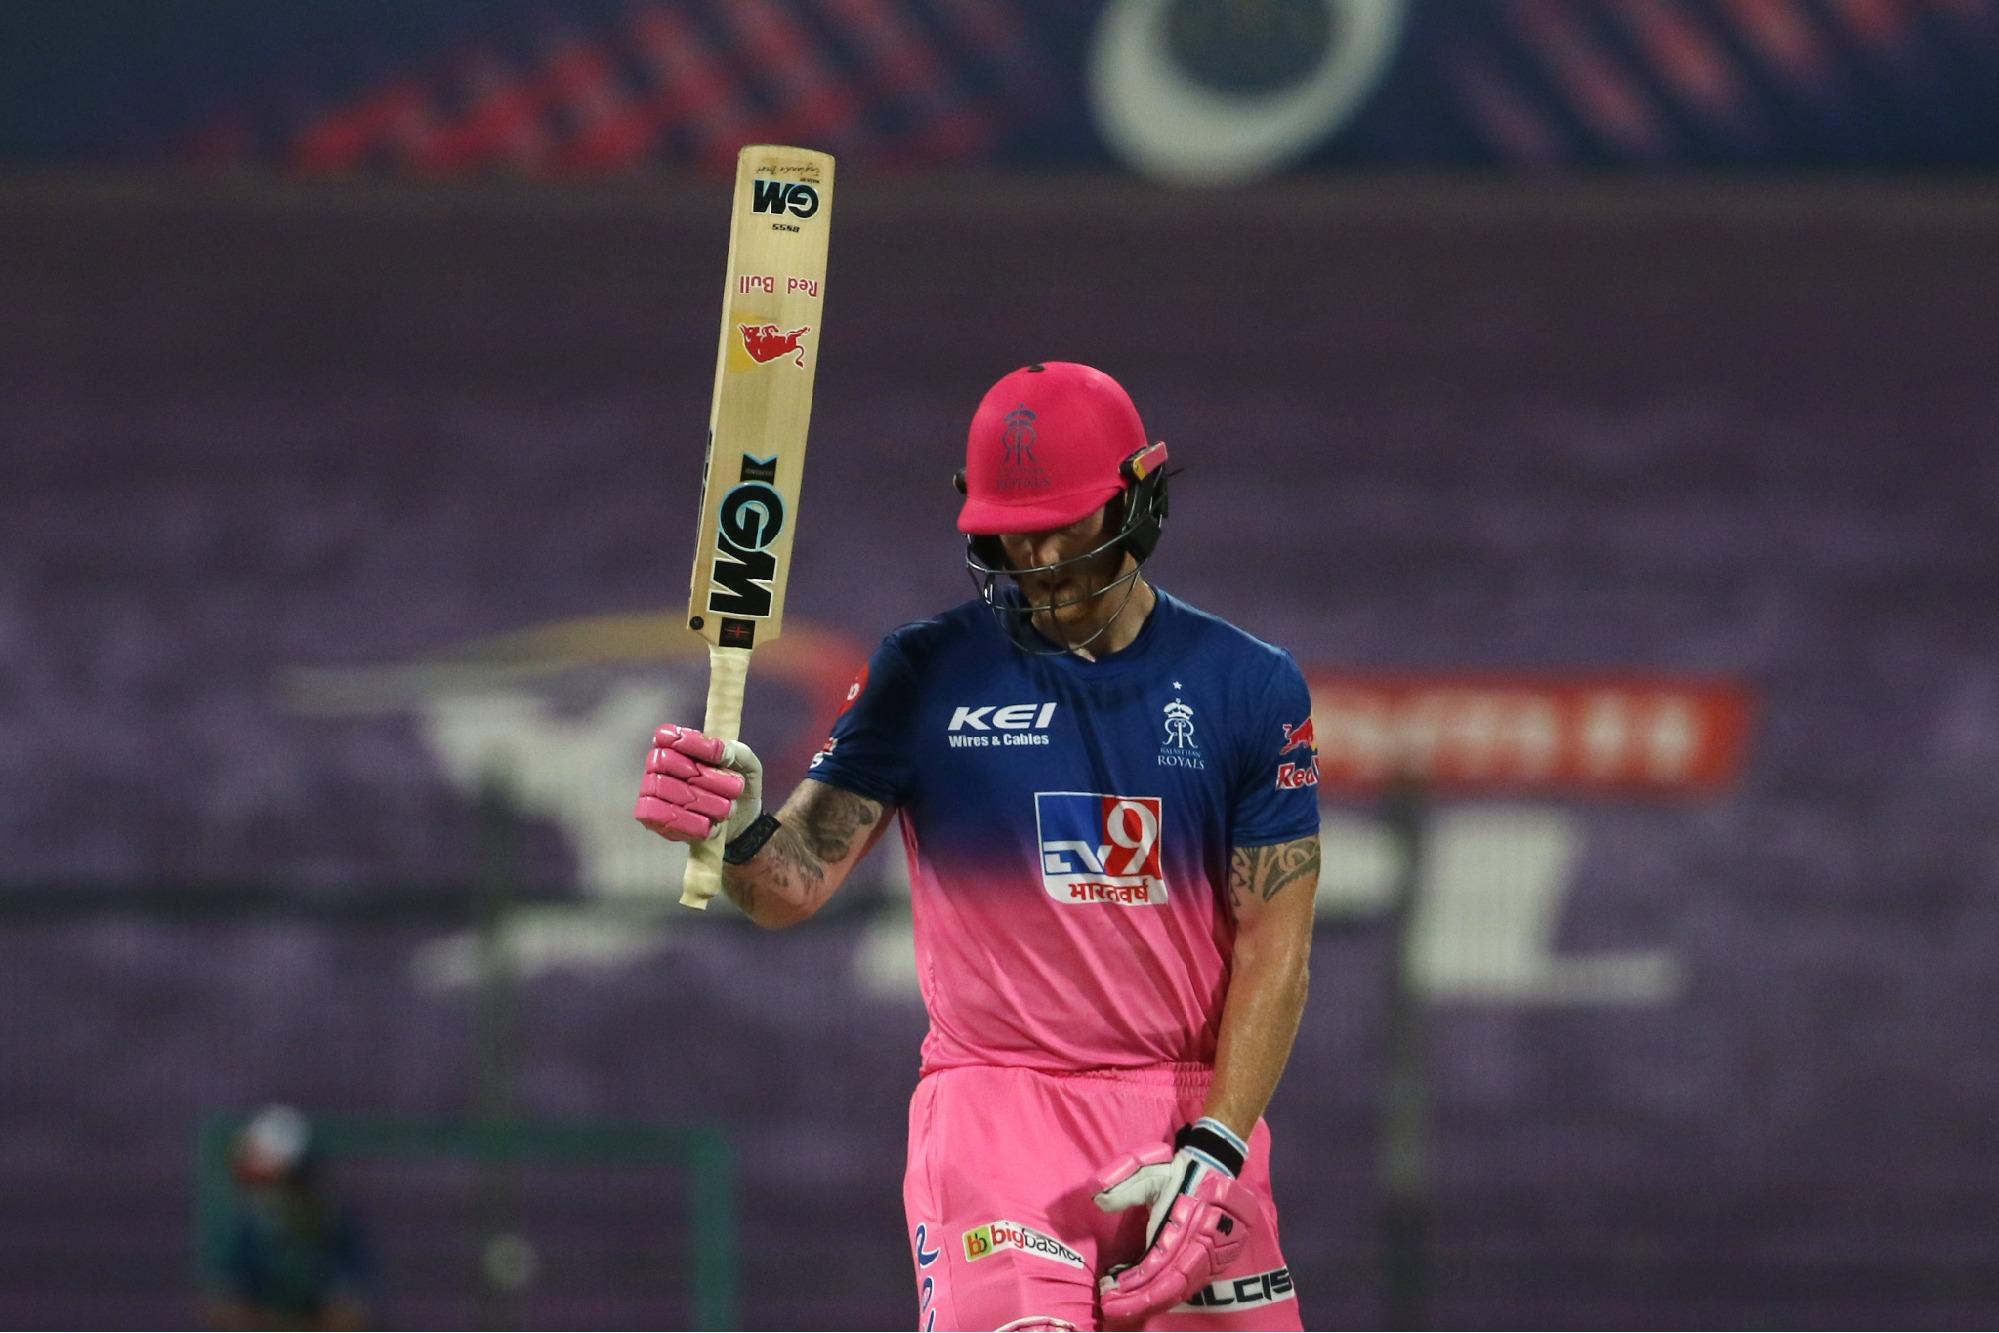 Rajasthan Royals defeat KingsXIPunjab by 7 wickets